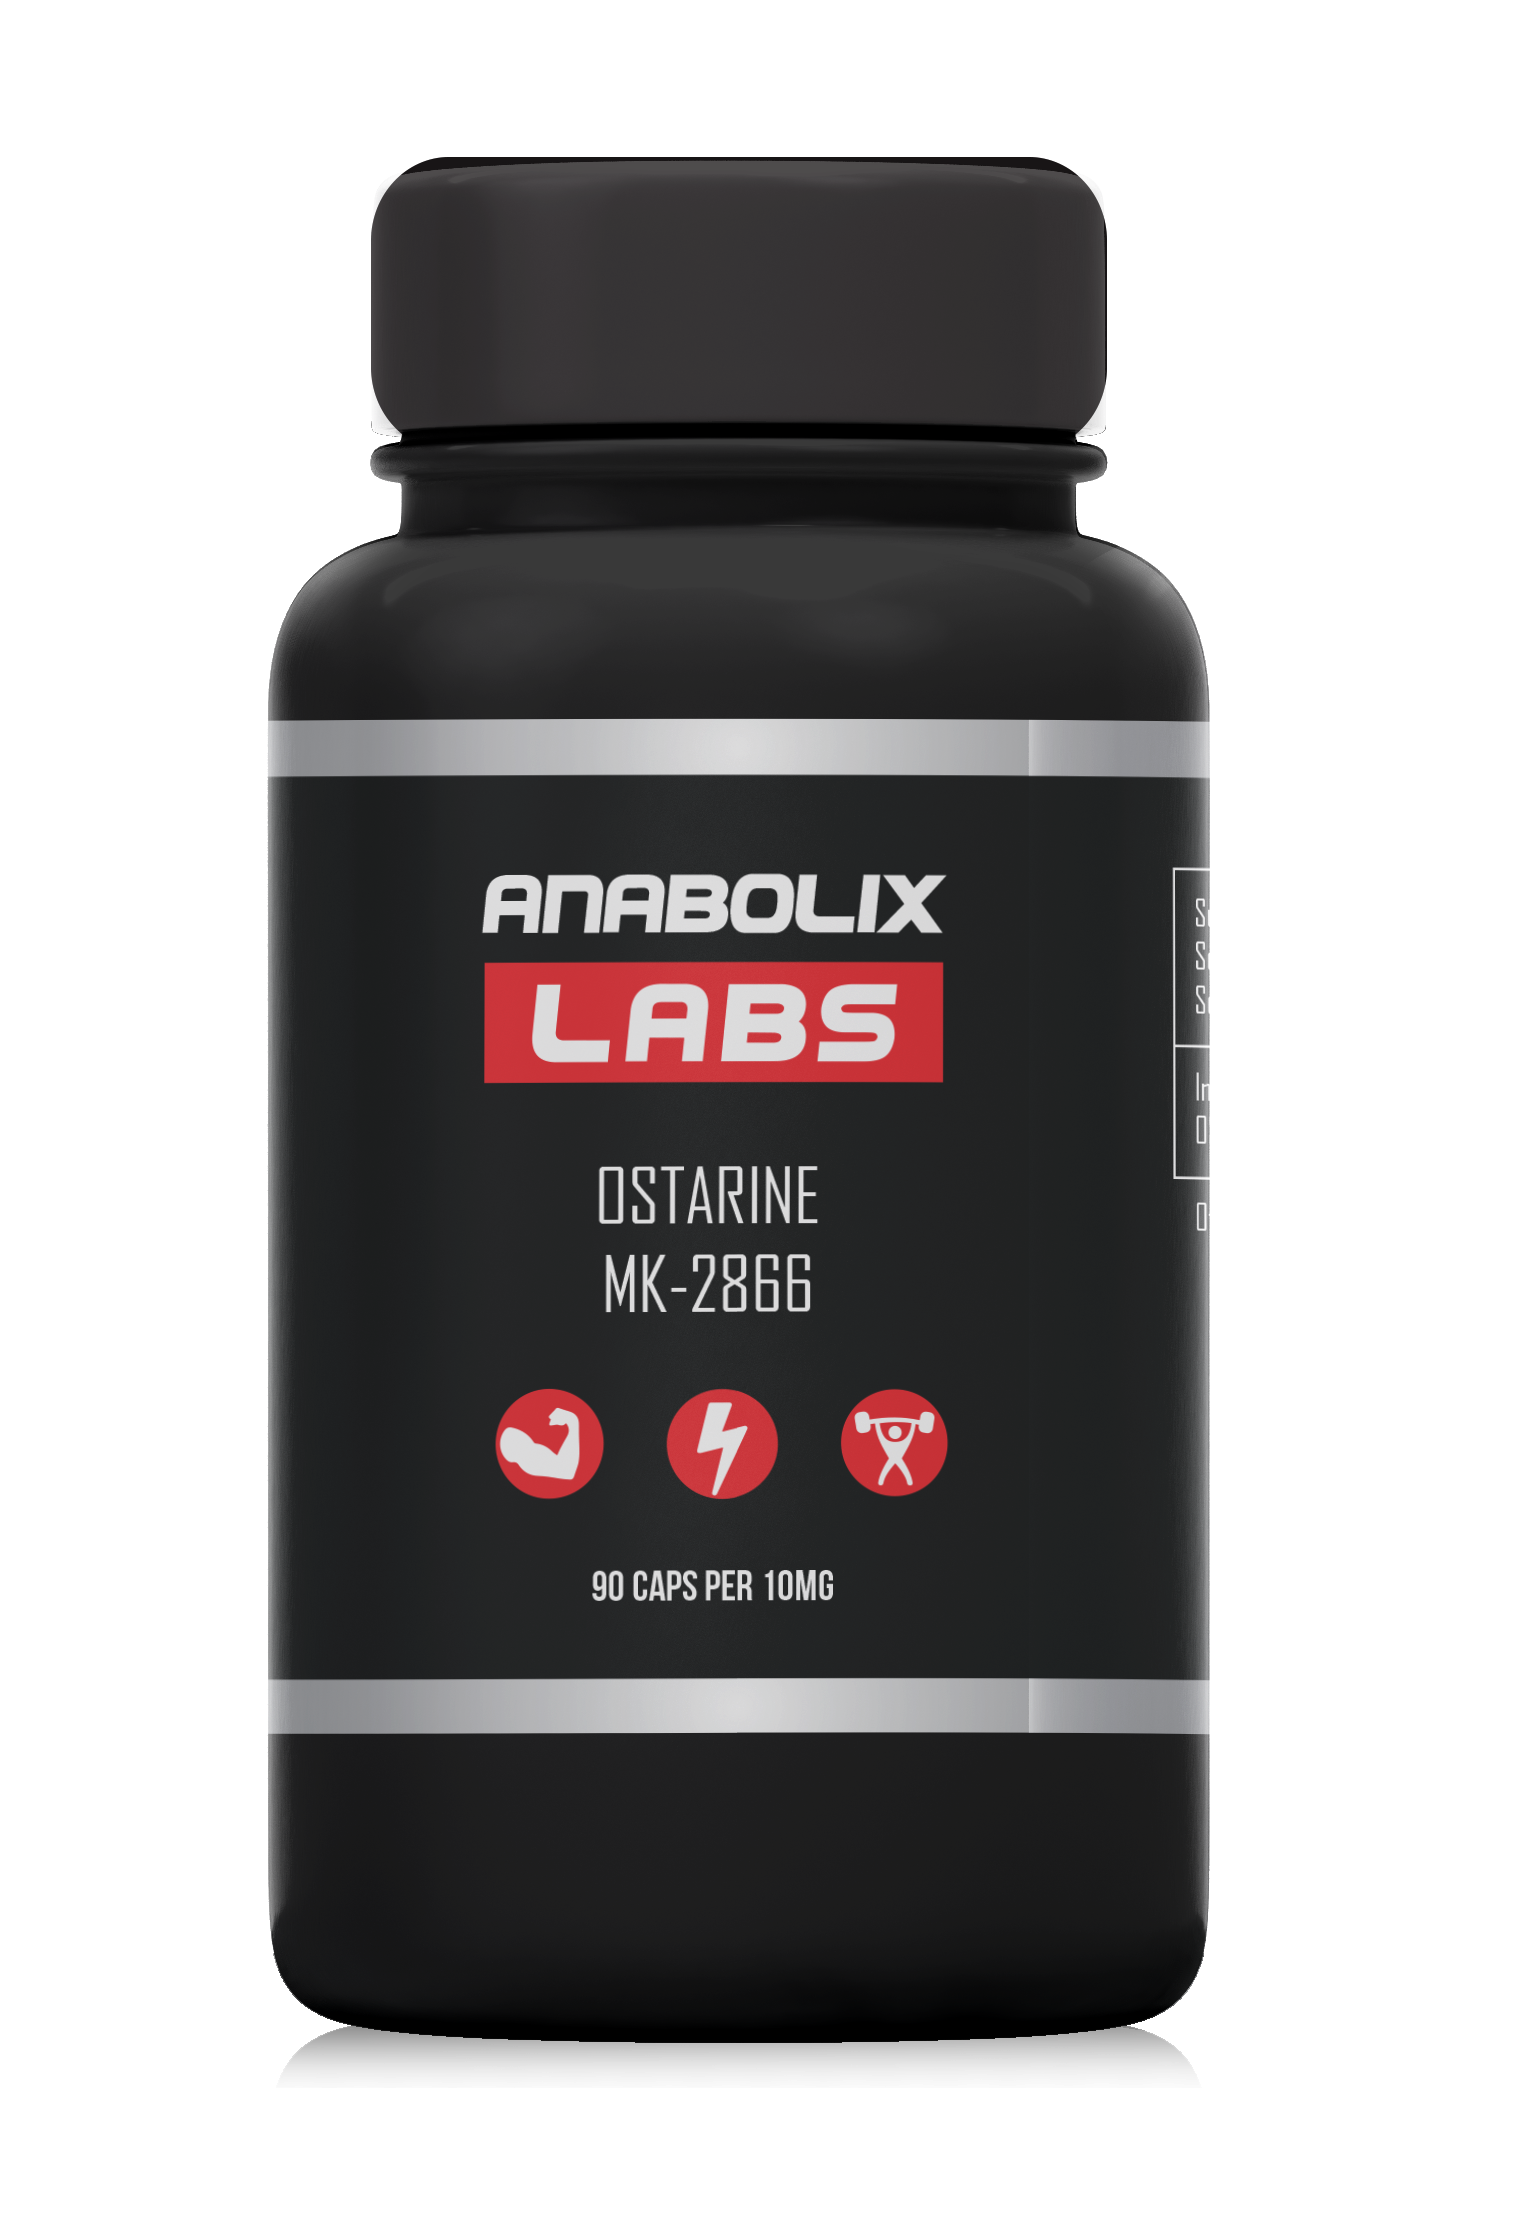 Ostarine   Anabolix Labs